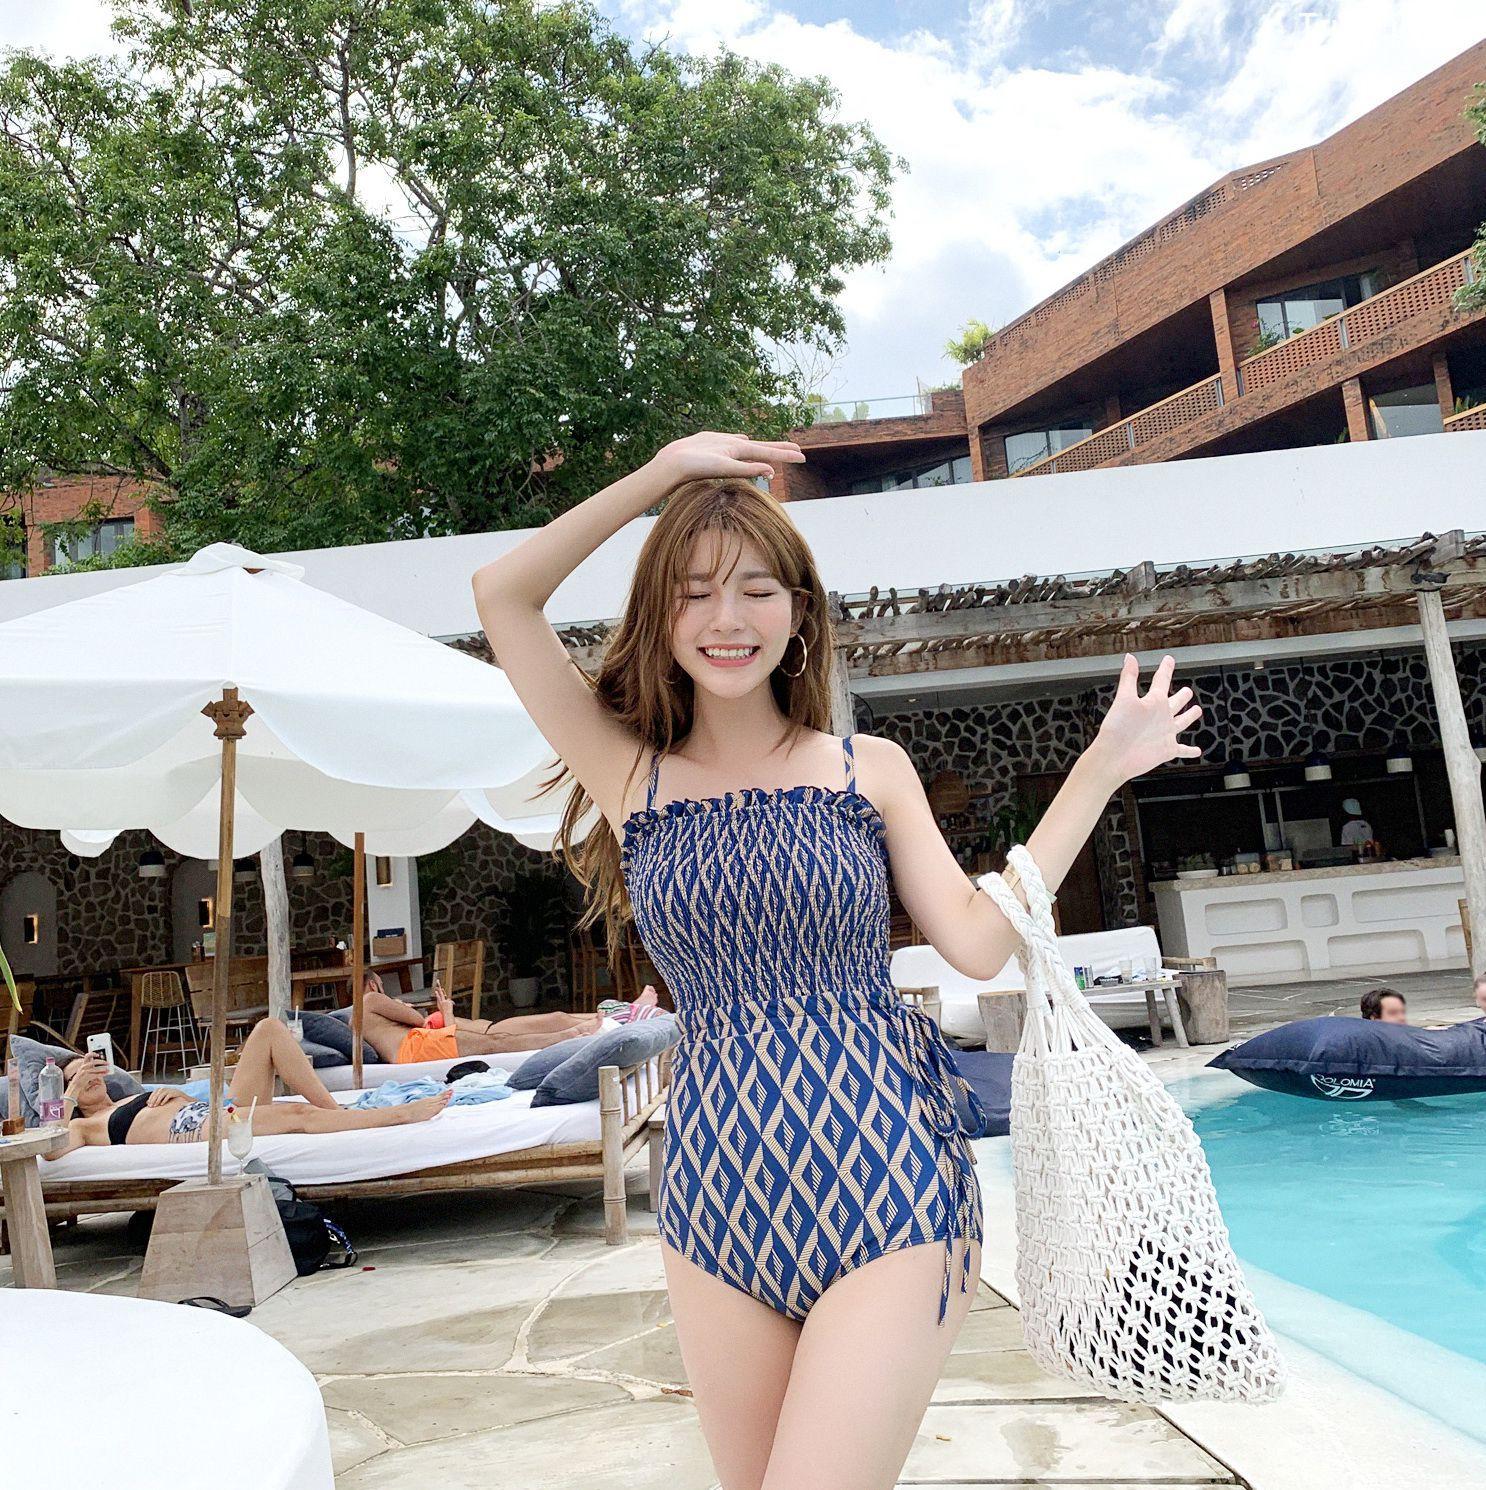 Image Korean Fashion Model - Cha Yoo Jin - Diamond Smoke Monokini - TruePic.net - Picture-4